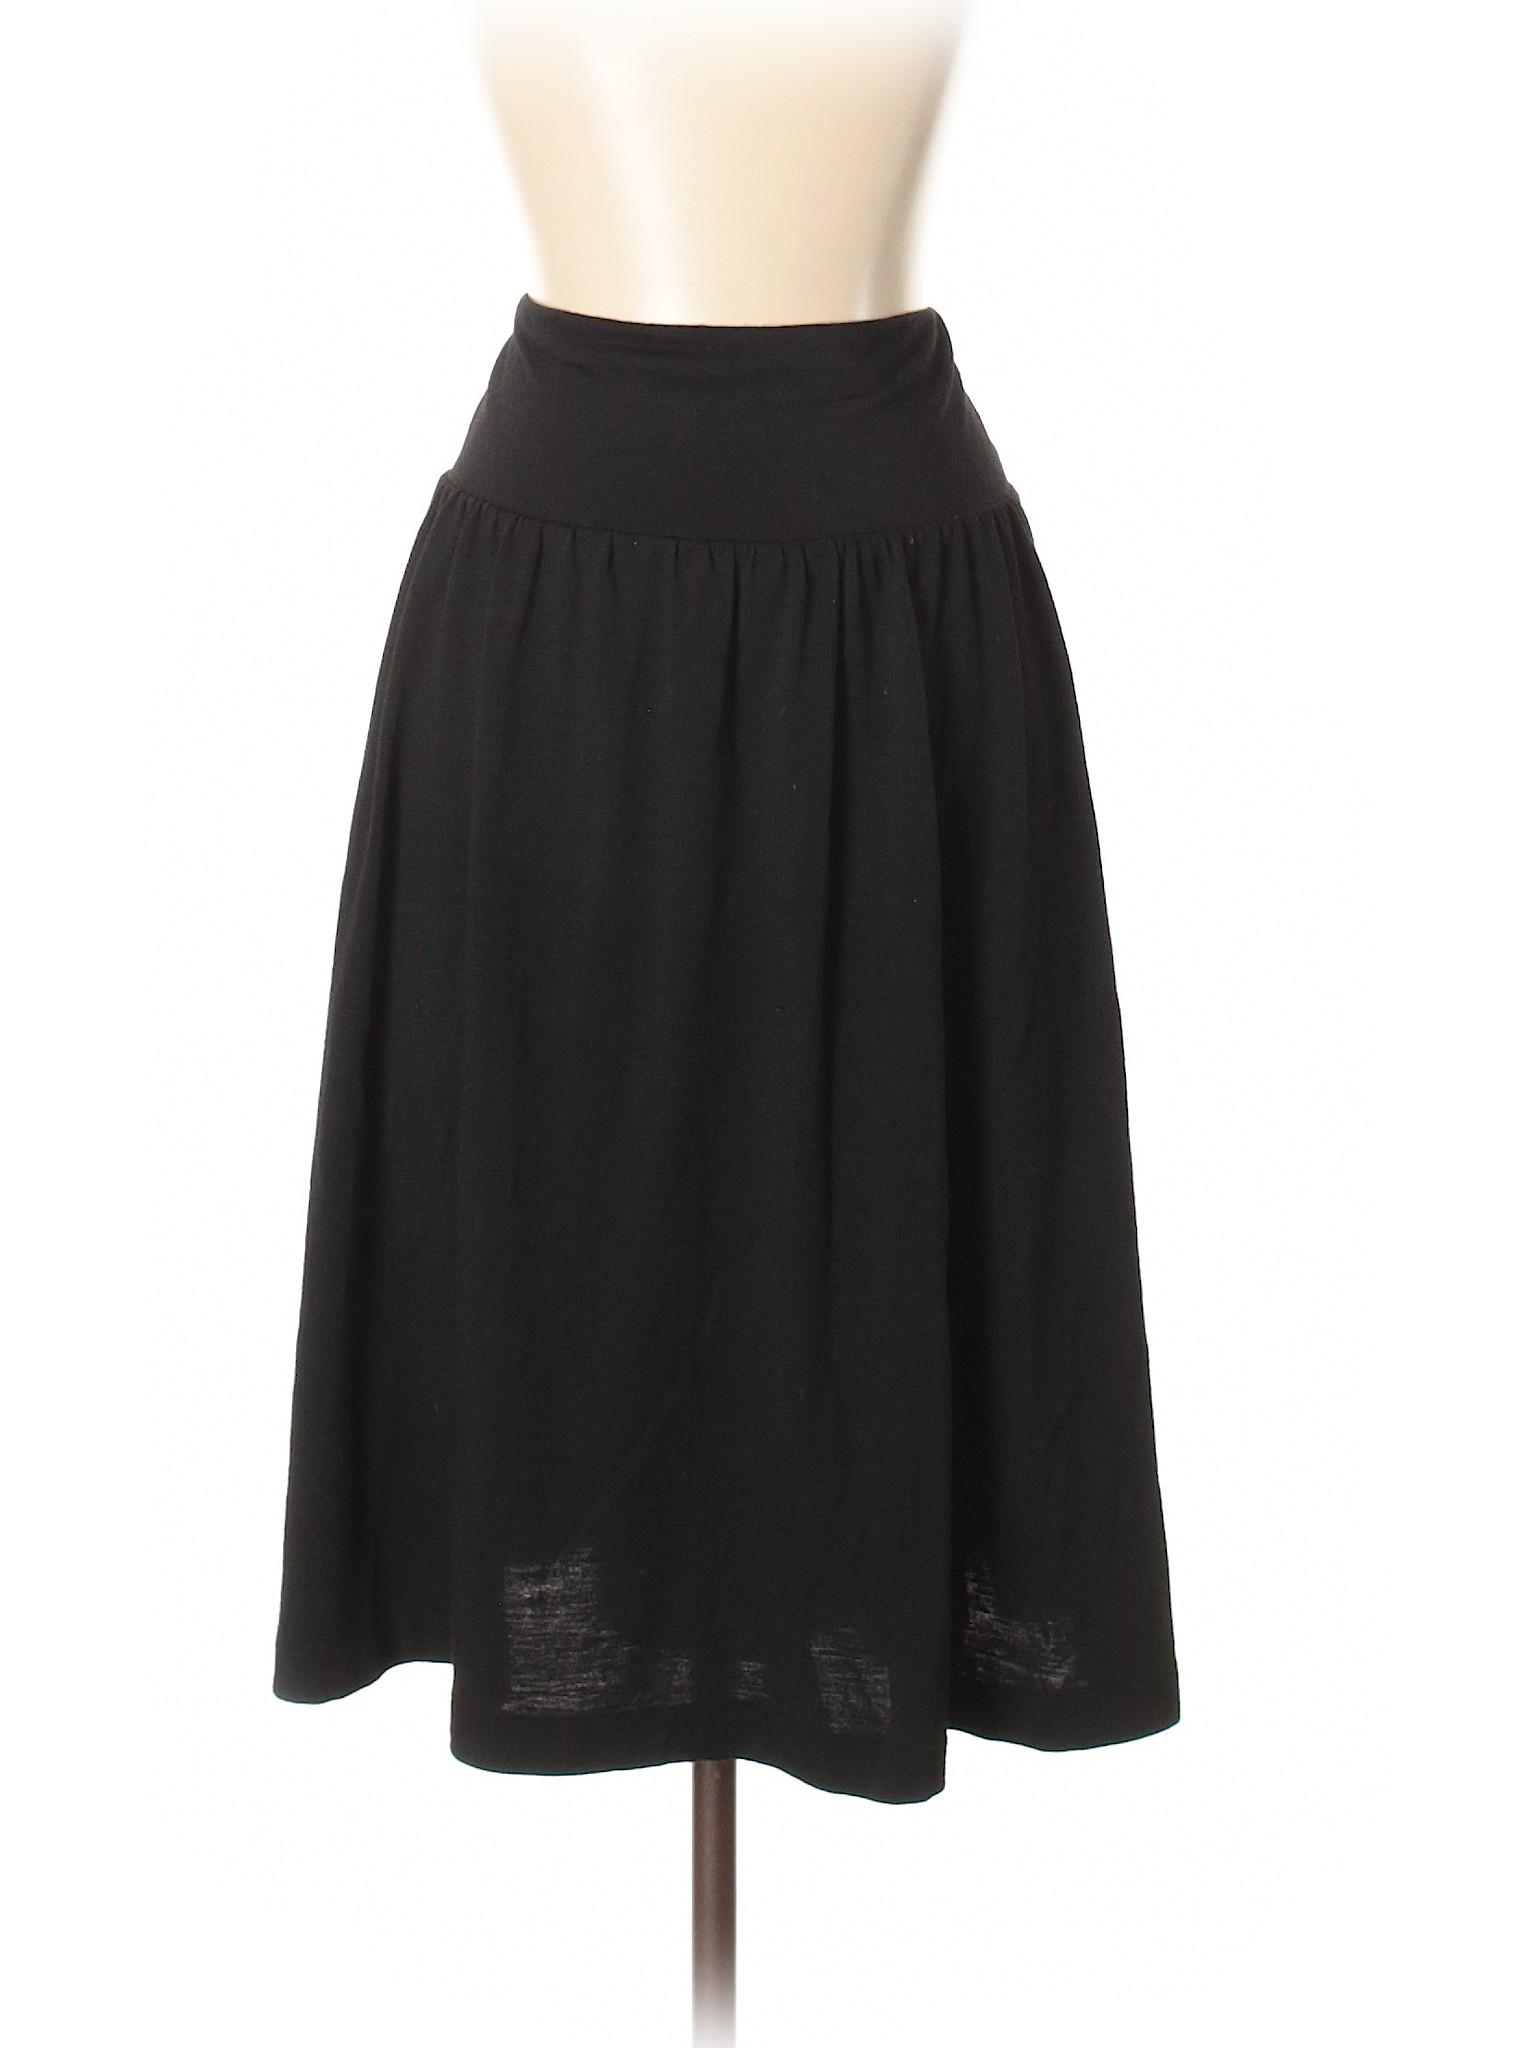 Banana winter Wool Leisure Skirt Republic A8qn05